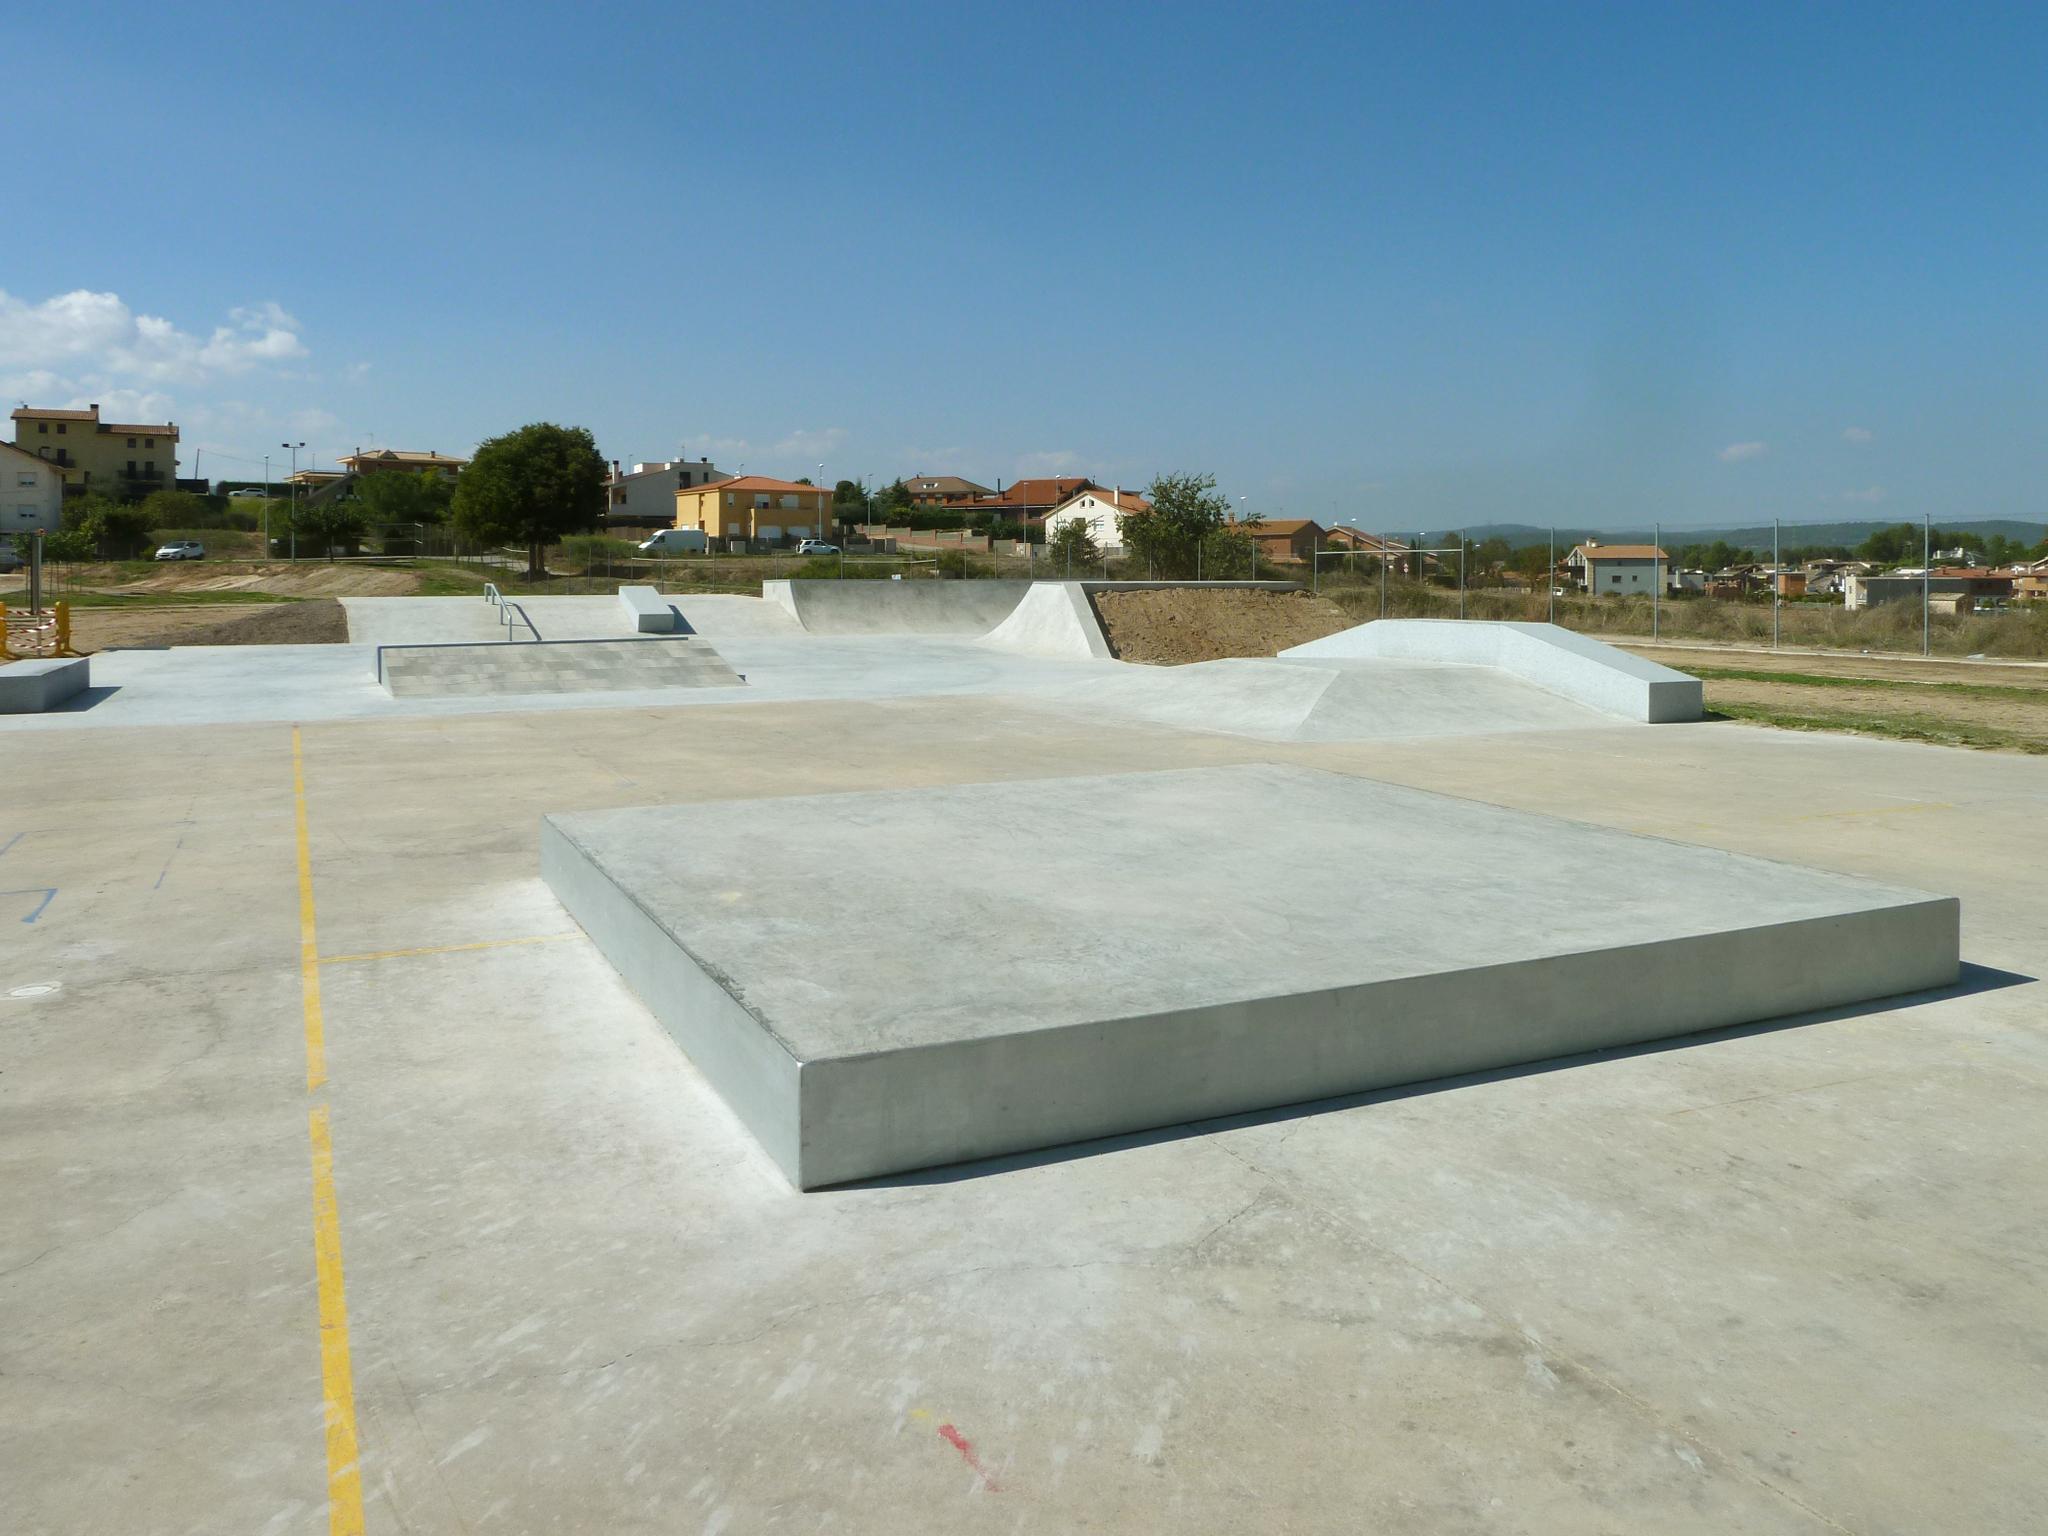 Skate-Architects-Navarcles-Skatepark-Skateplaza-08-AAP1120731.jpg